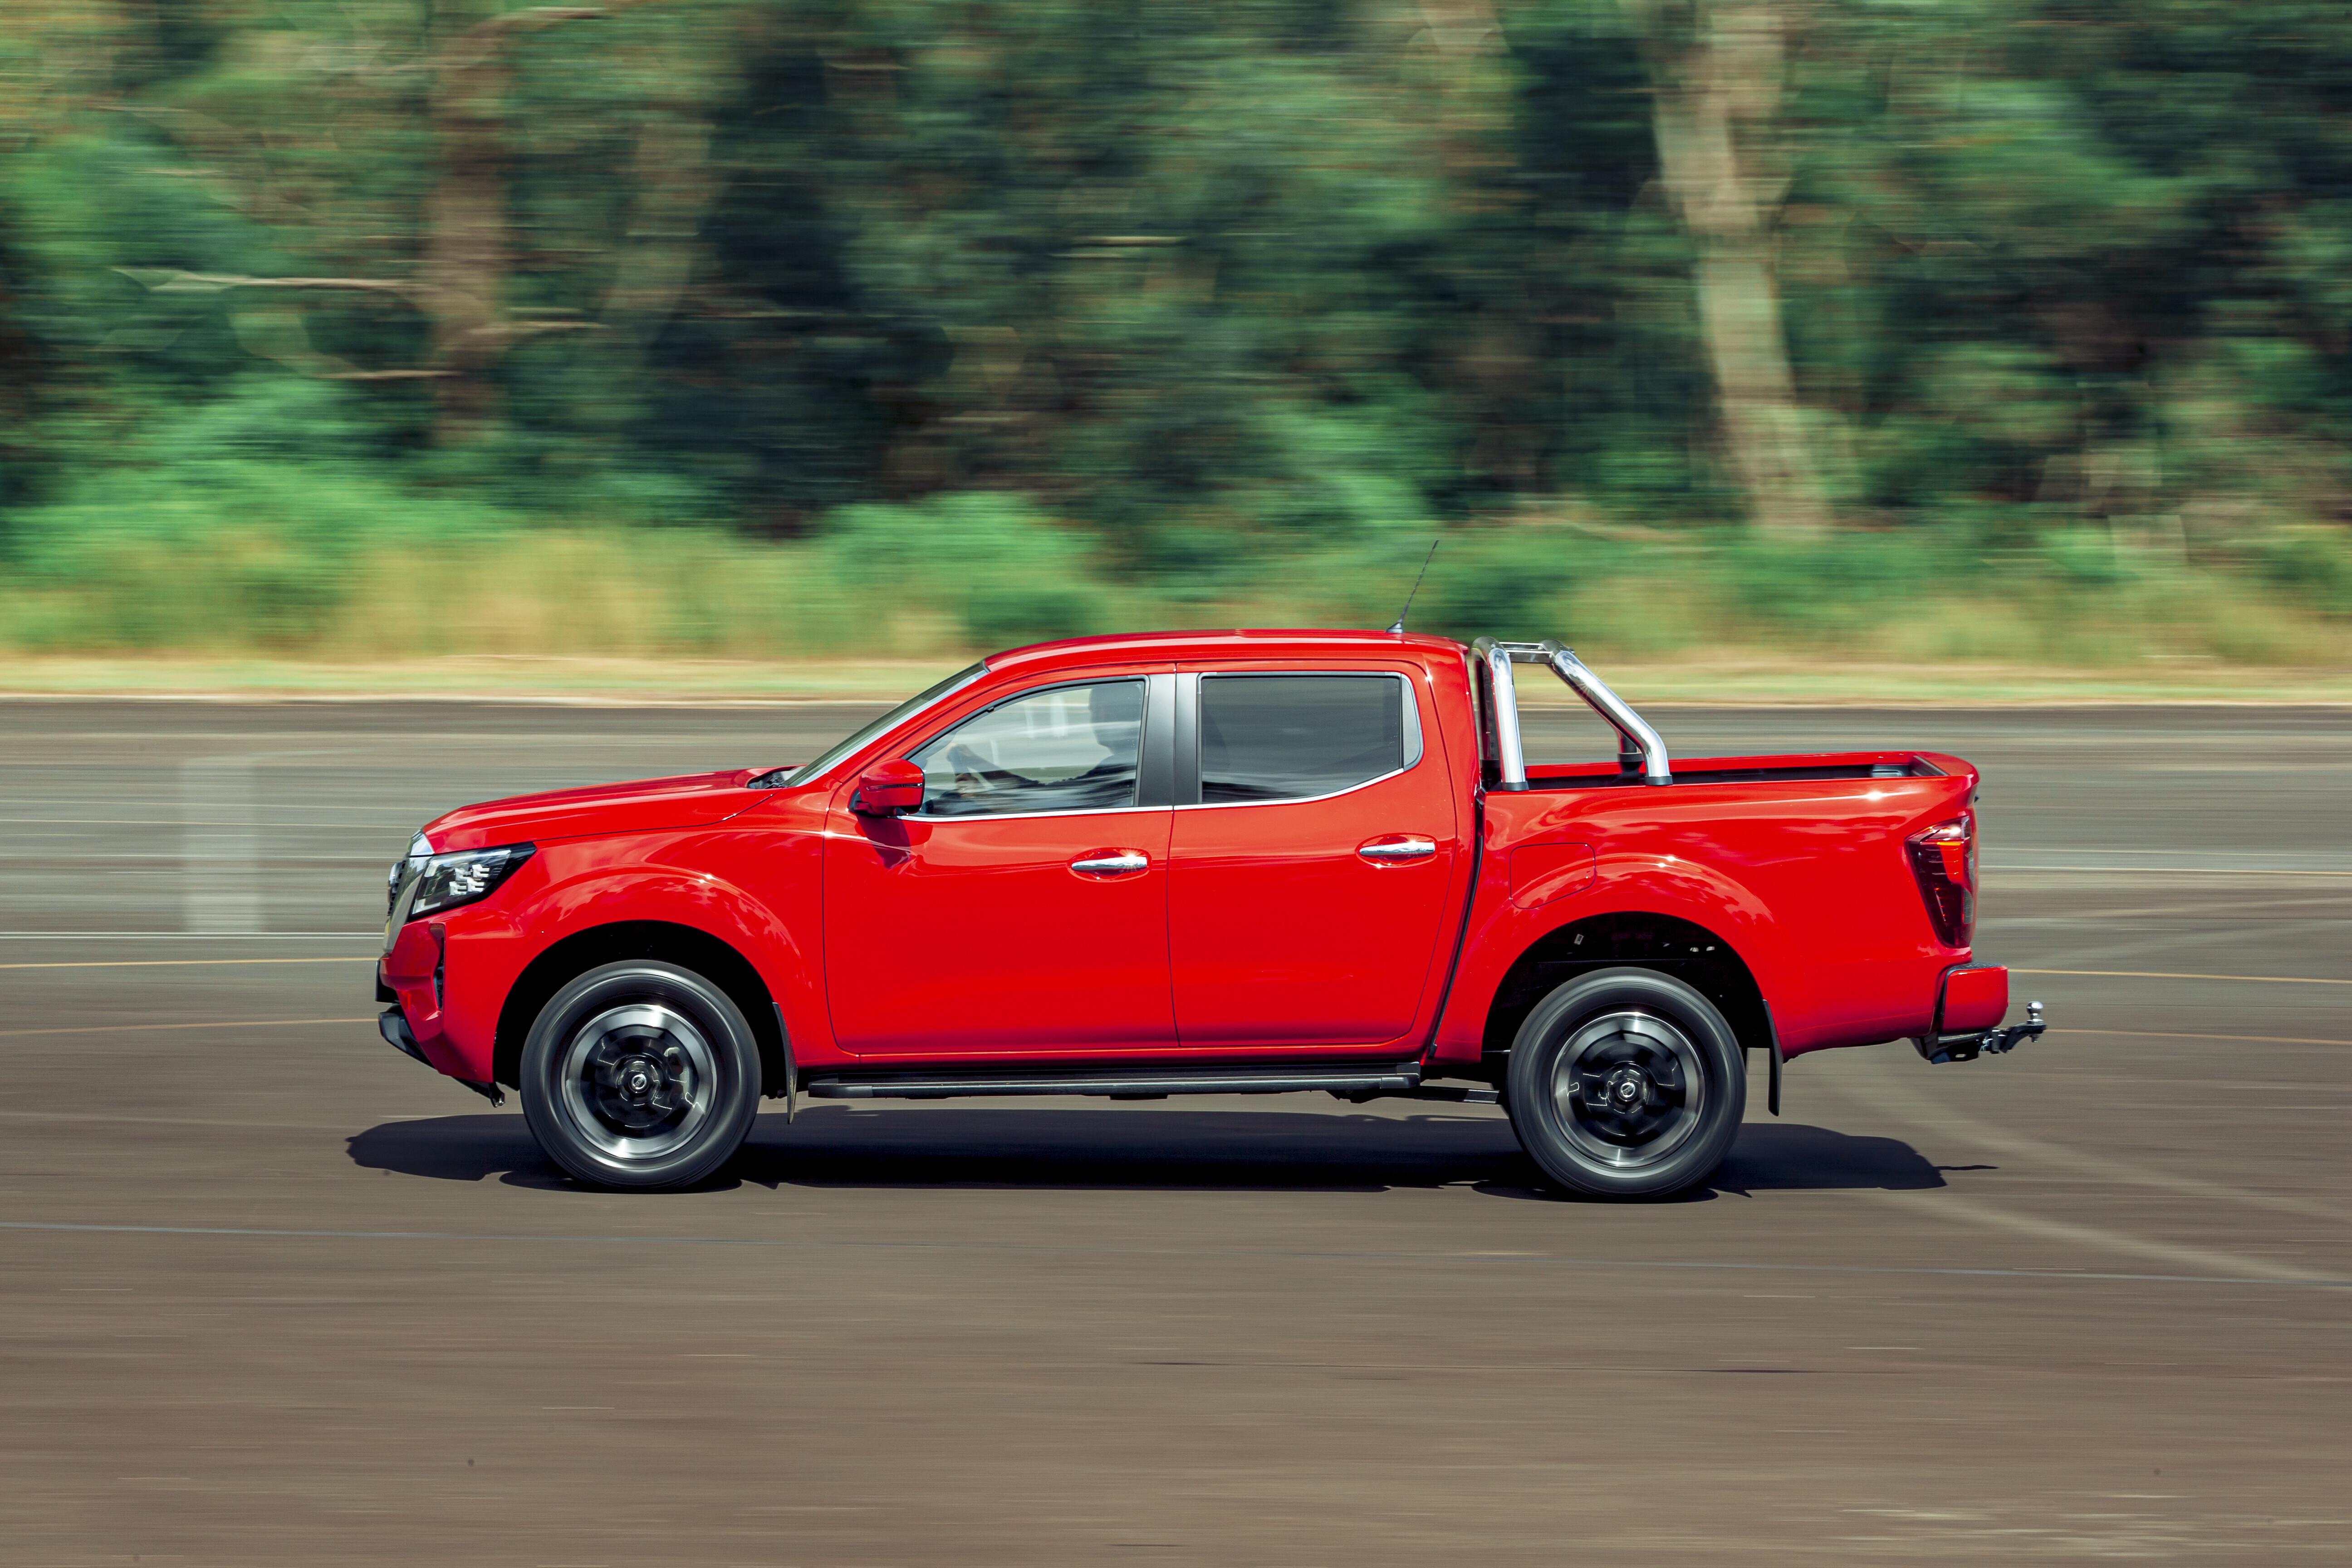 4 X 4 Australia Comparisons 2021 May 21 Nissan Navara ST X Performance Acceleration Test